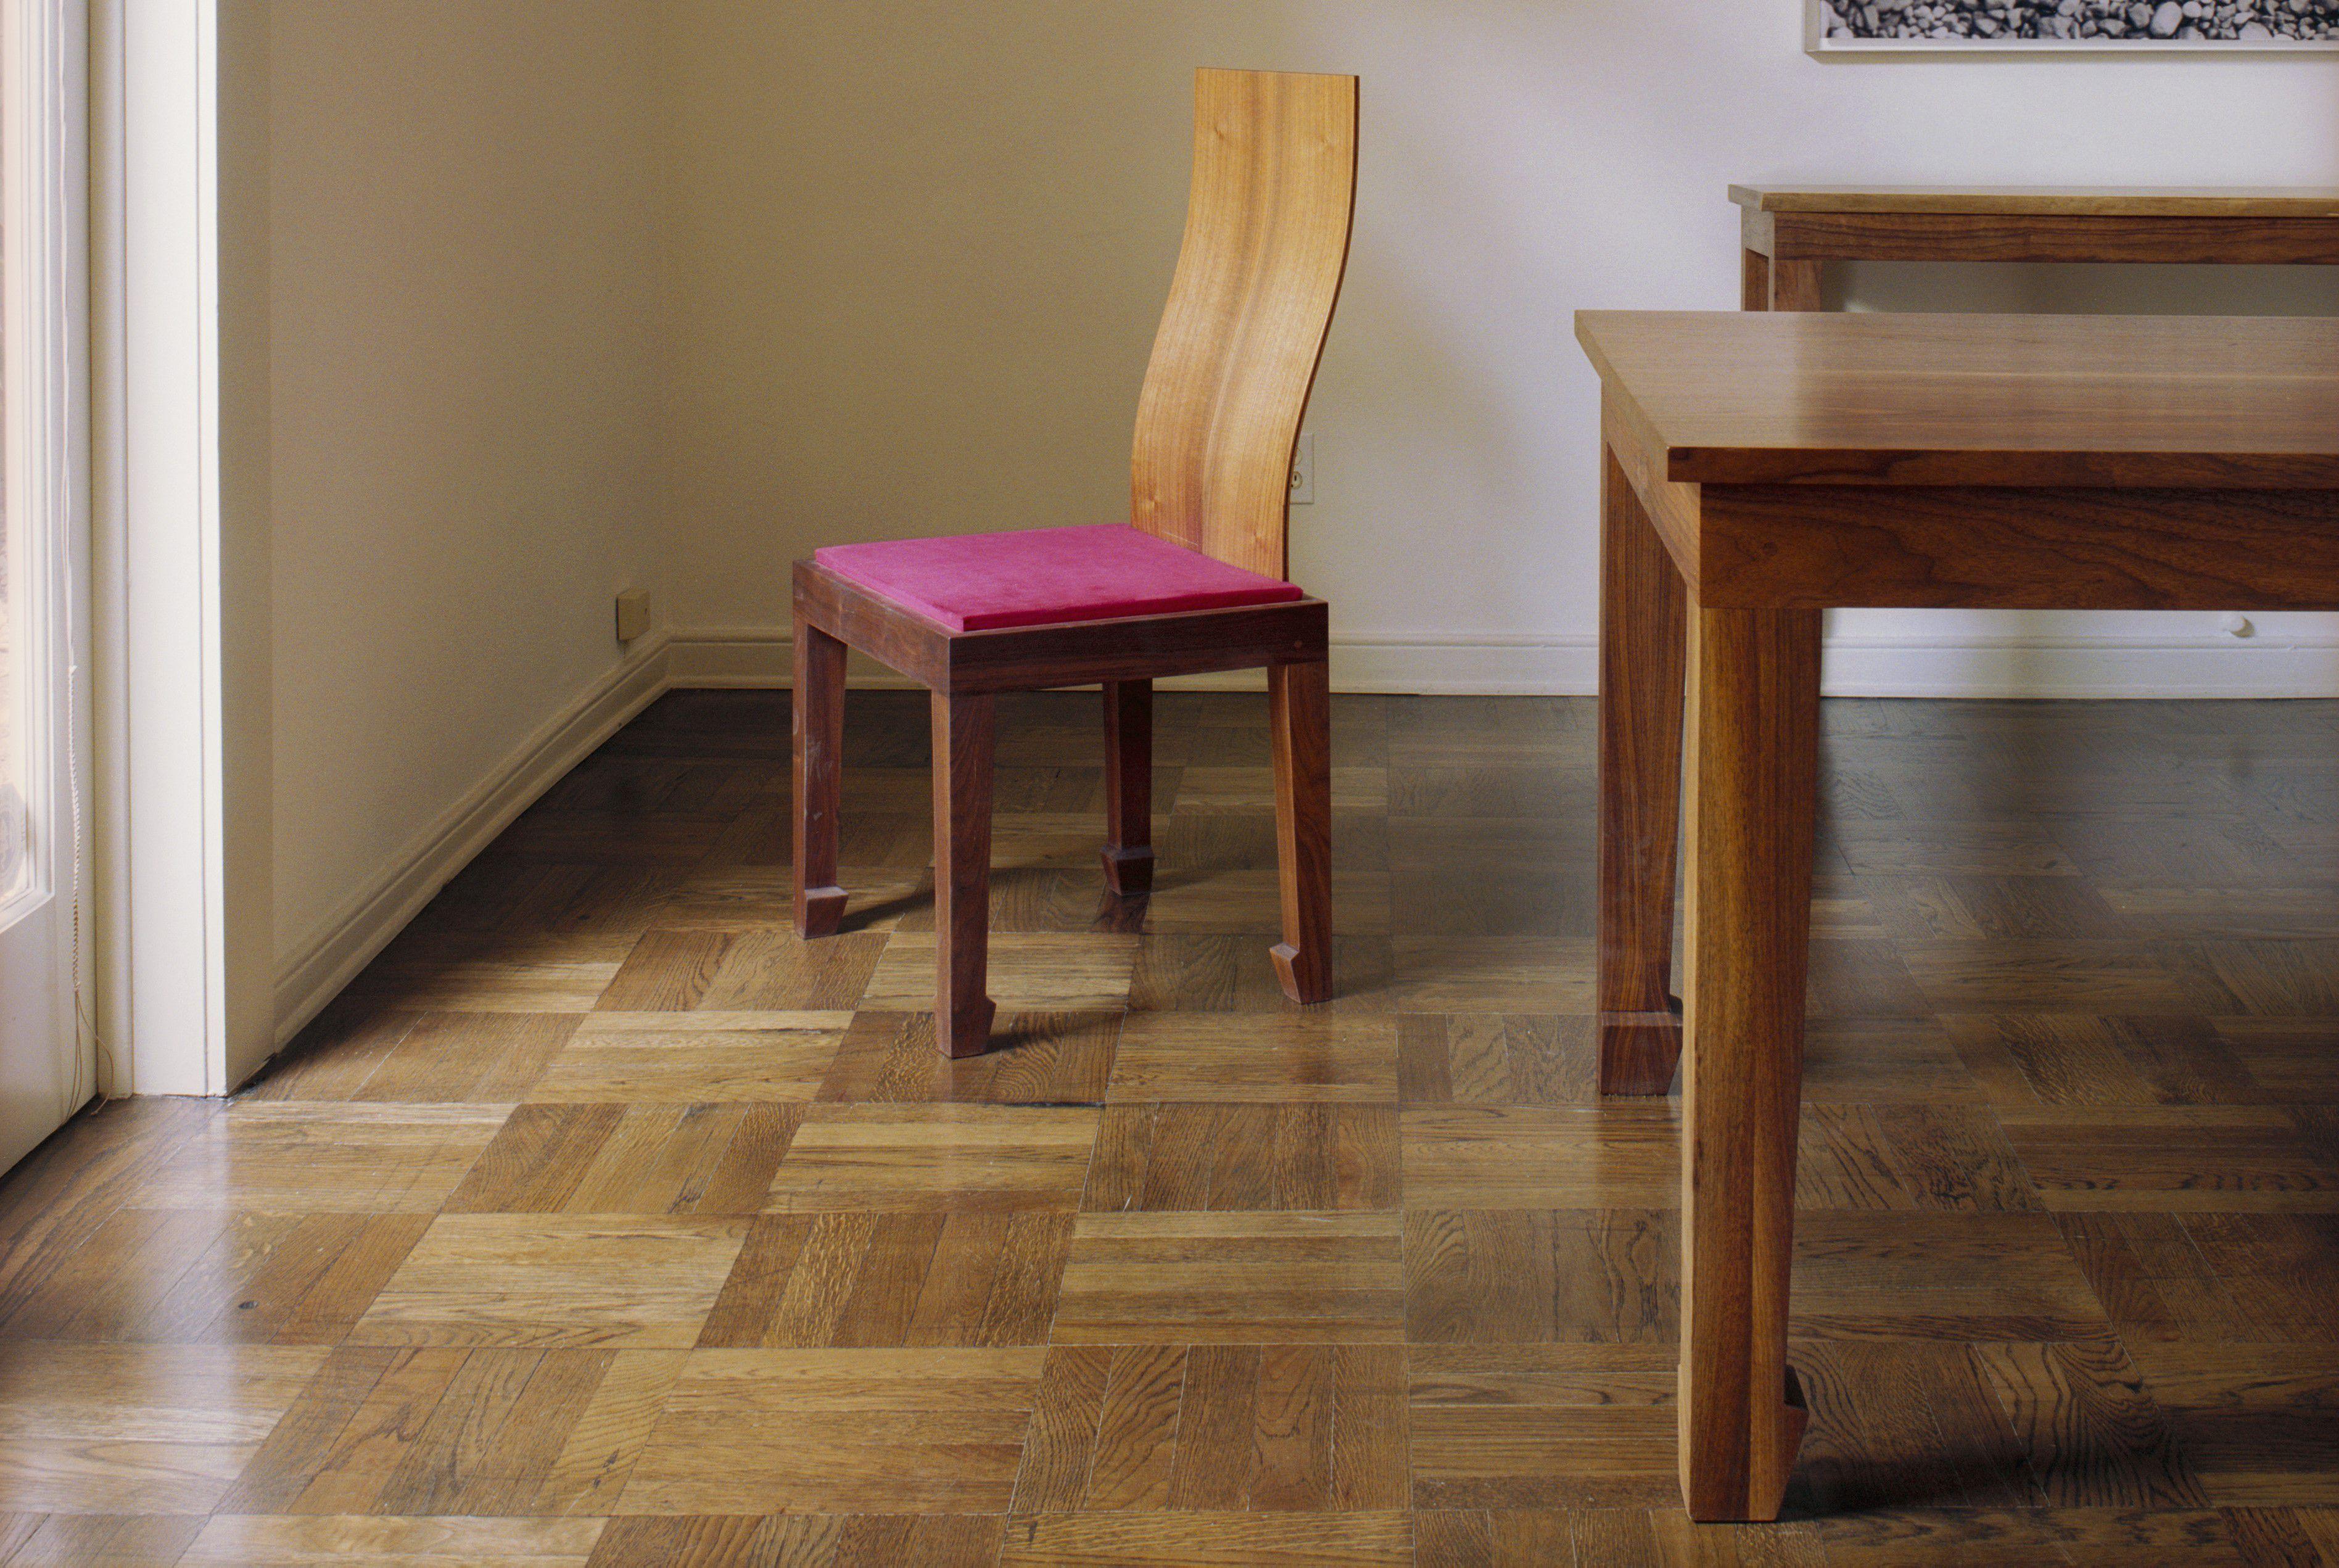 engineered hardwood flooring reviews of wood parquet flooring poised for a resurgence pertaining to wood parquet flooring 529502452 576c78195f9b585875a1ac13